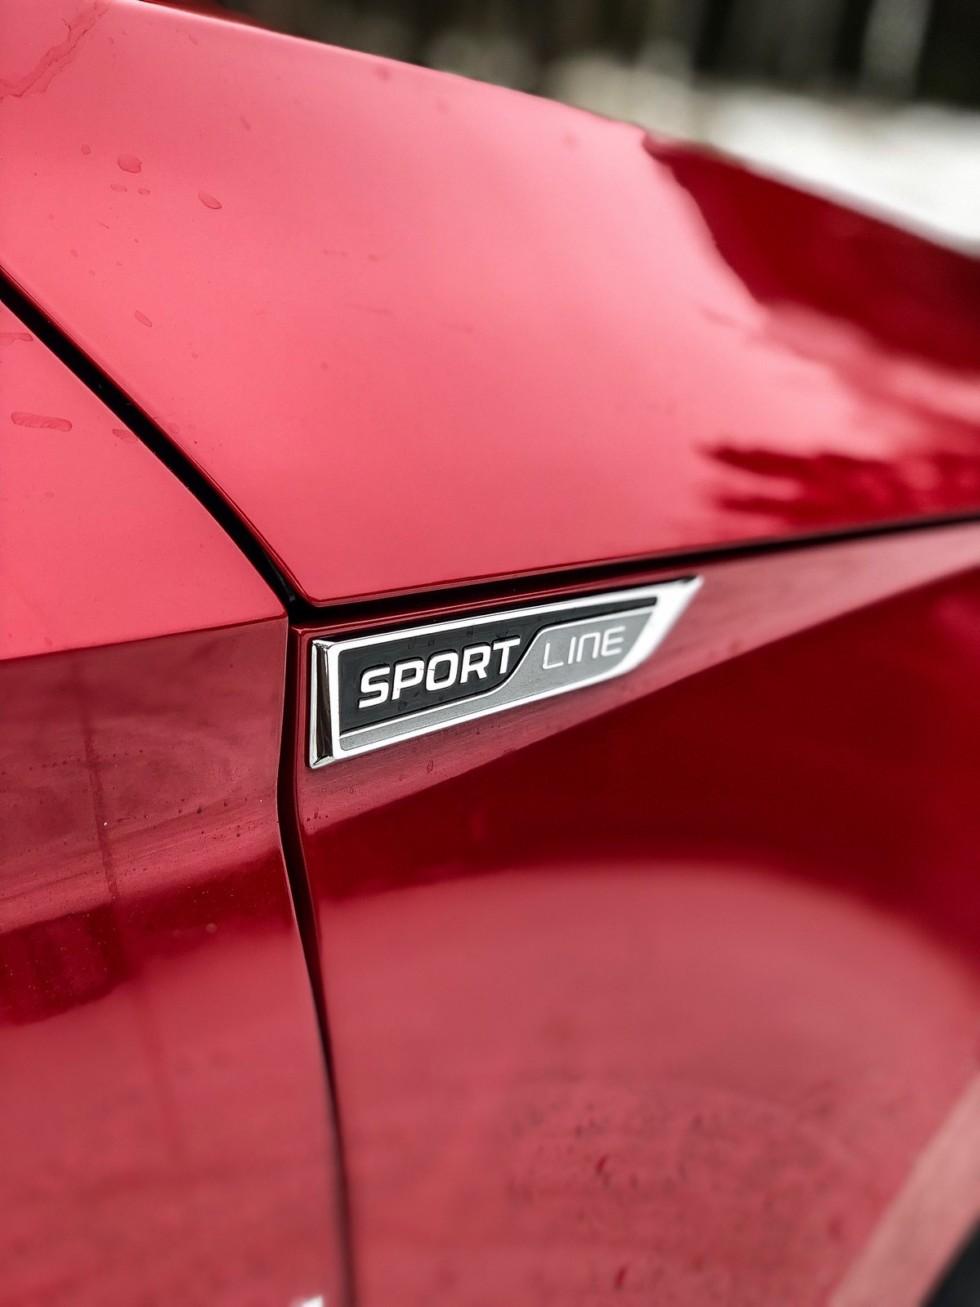 ŠKODA SUPERB 4x4 SportLine : бизнес-седан или Gran Turismo?